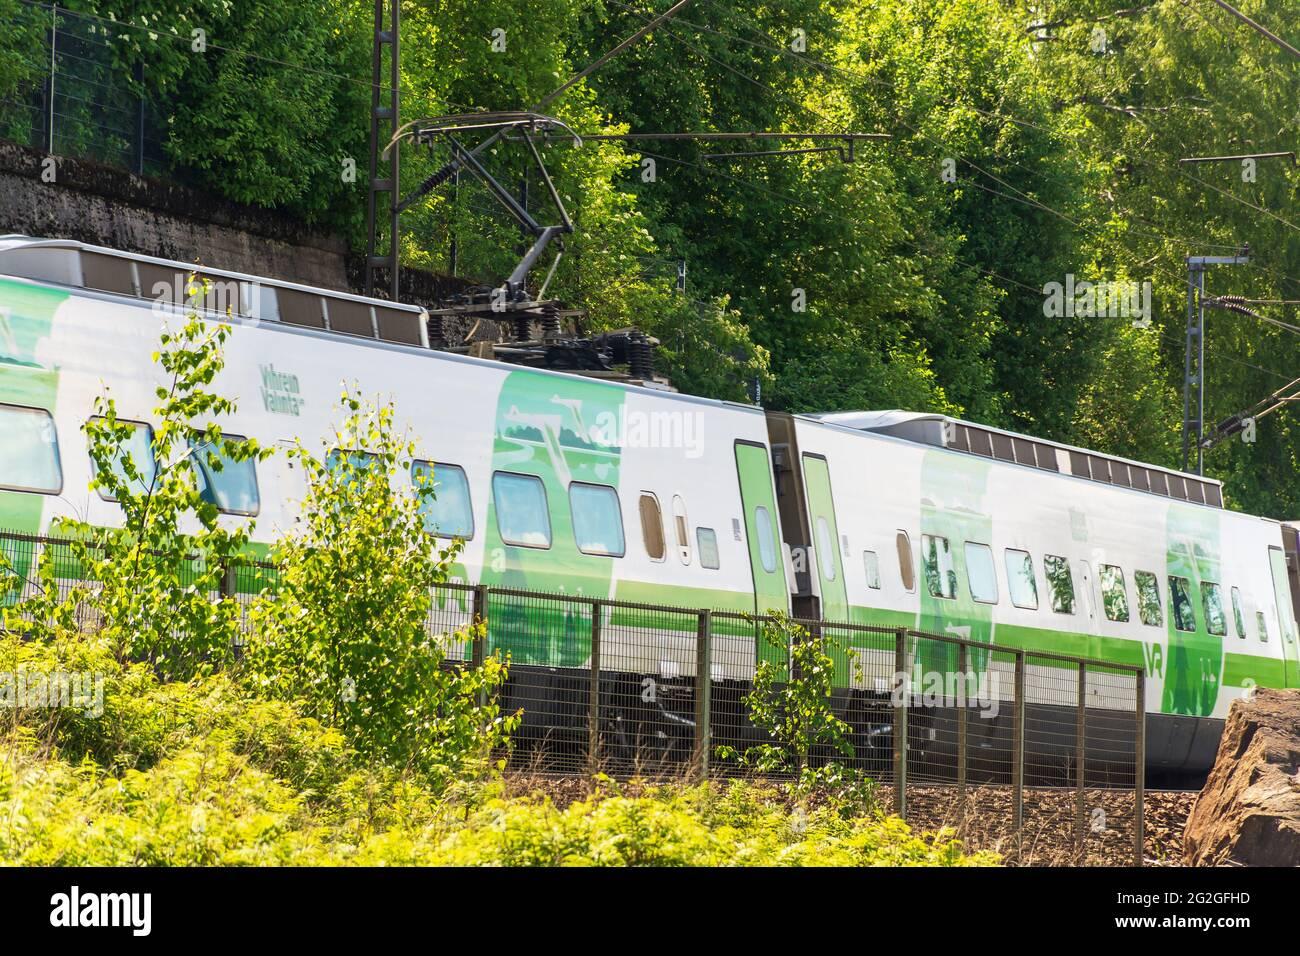 Passenger train on a ironn bridge in Tampere Finland Stock Photo